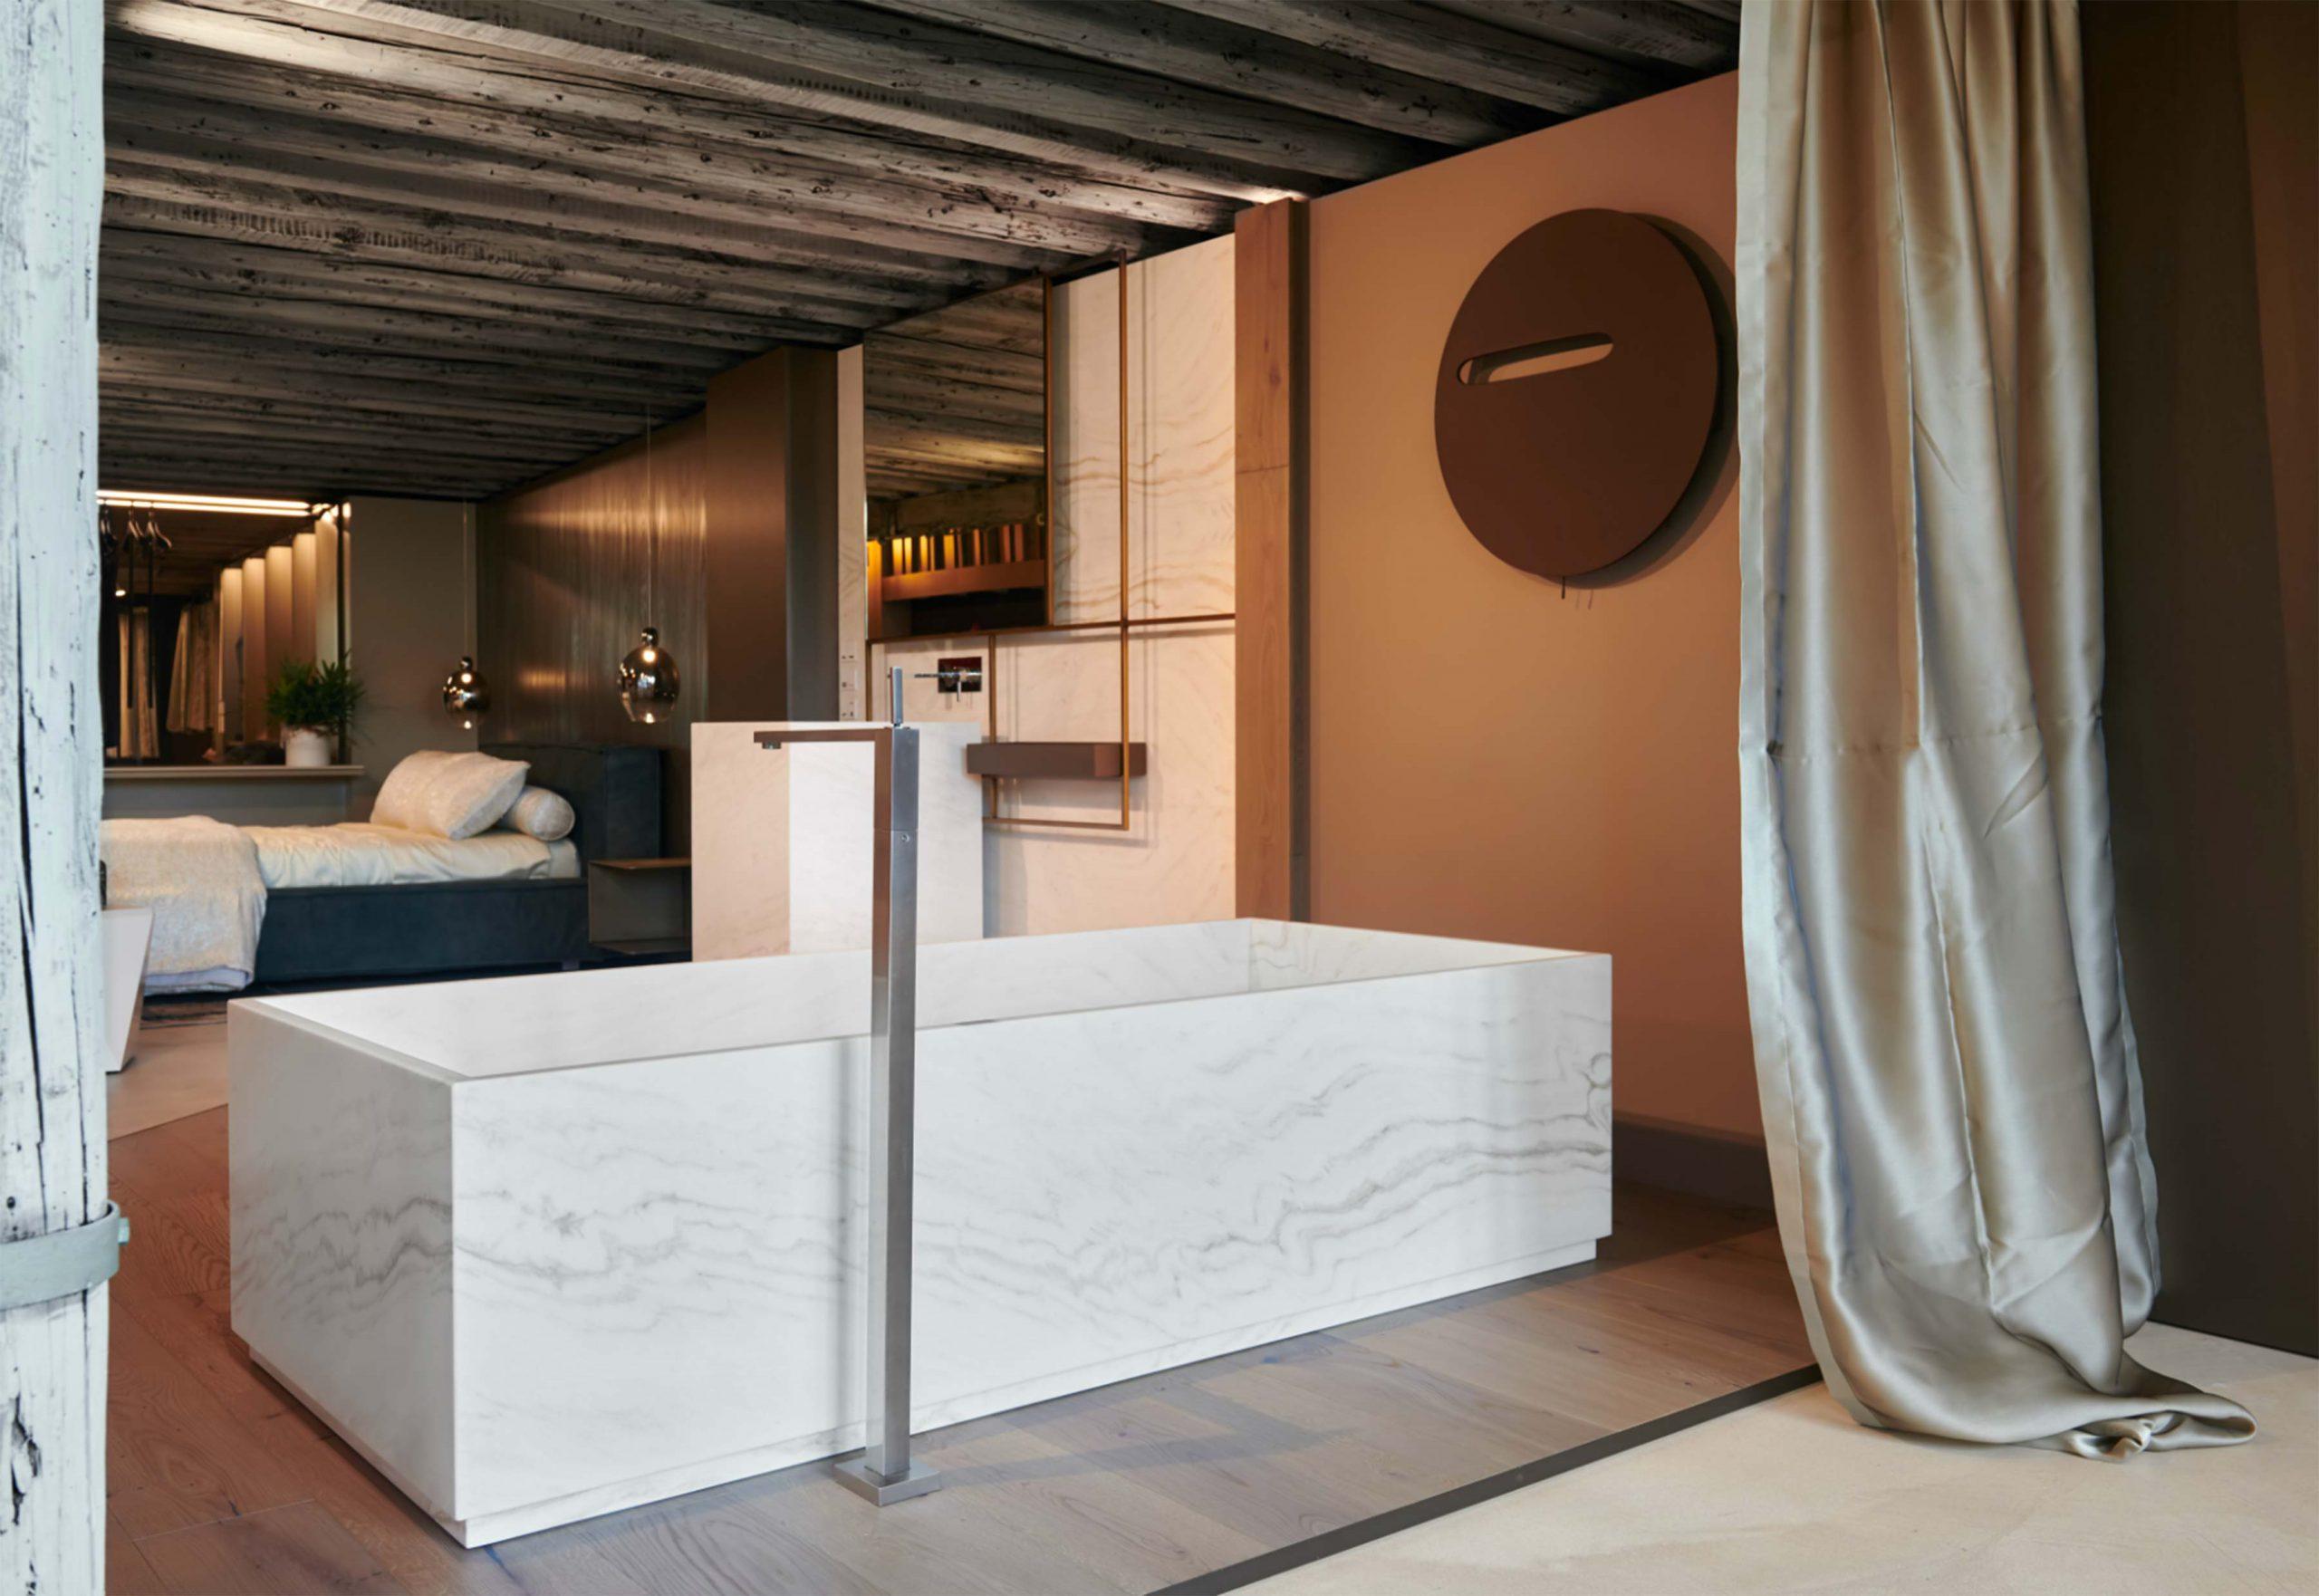 Concept Room - Design